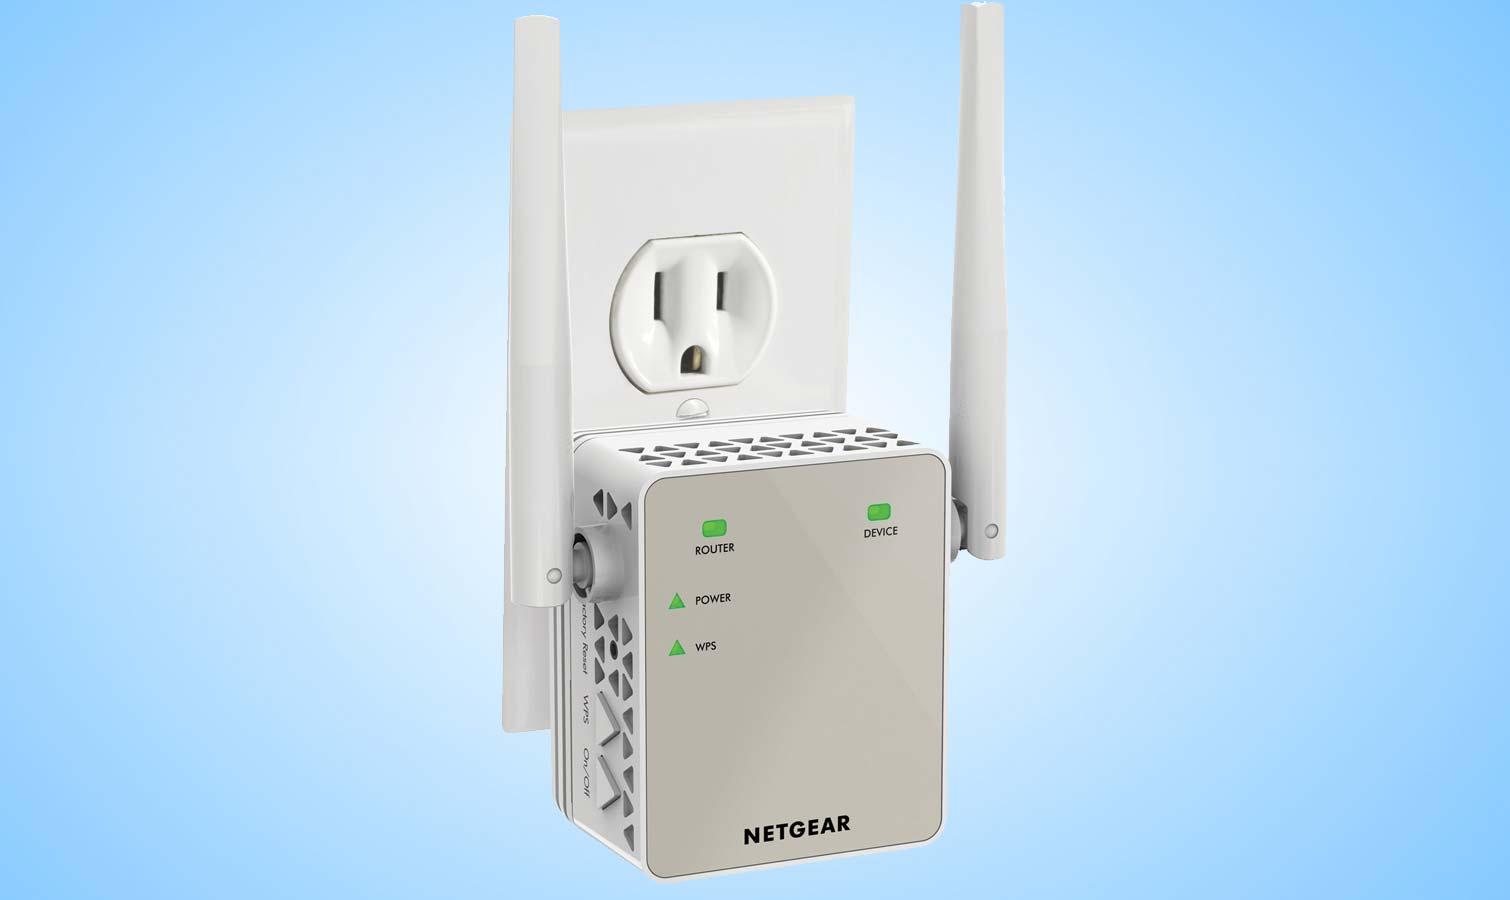 Netgear EX6120 AC1200 Essentials Edition Wi-Fi Range Extender – Full